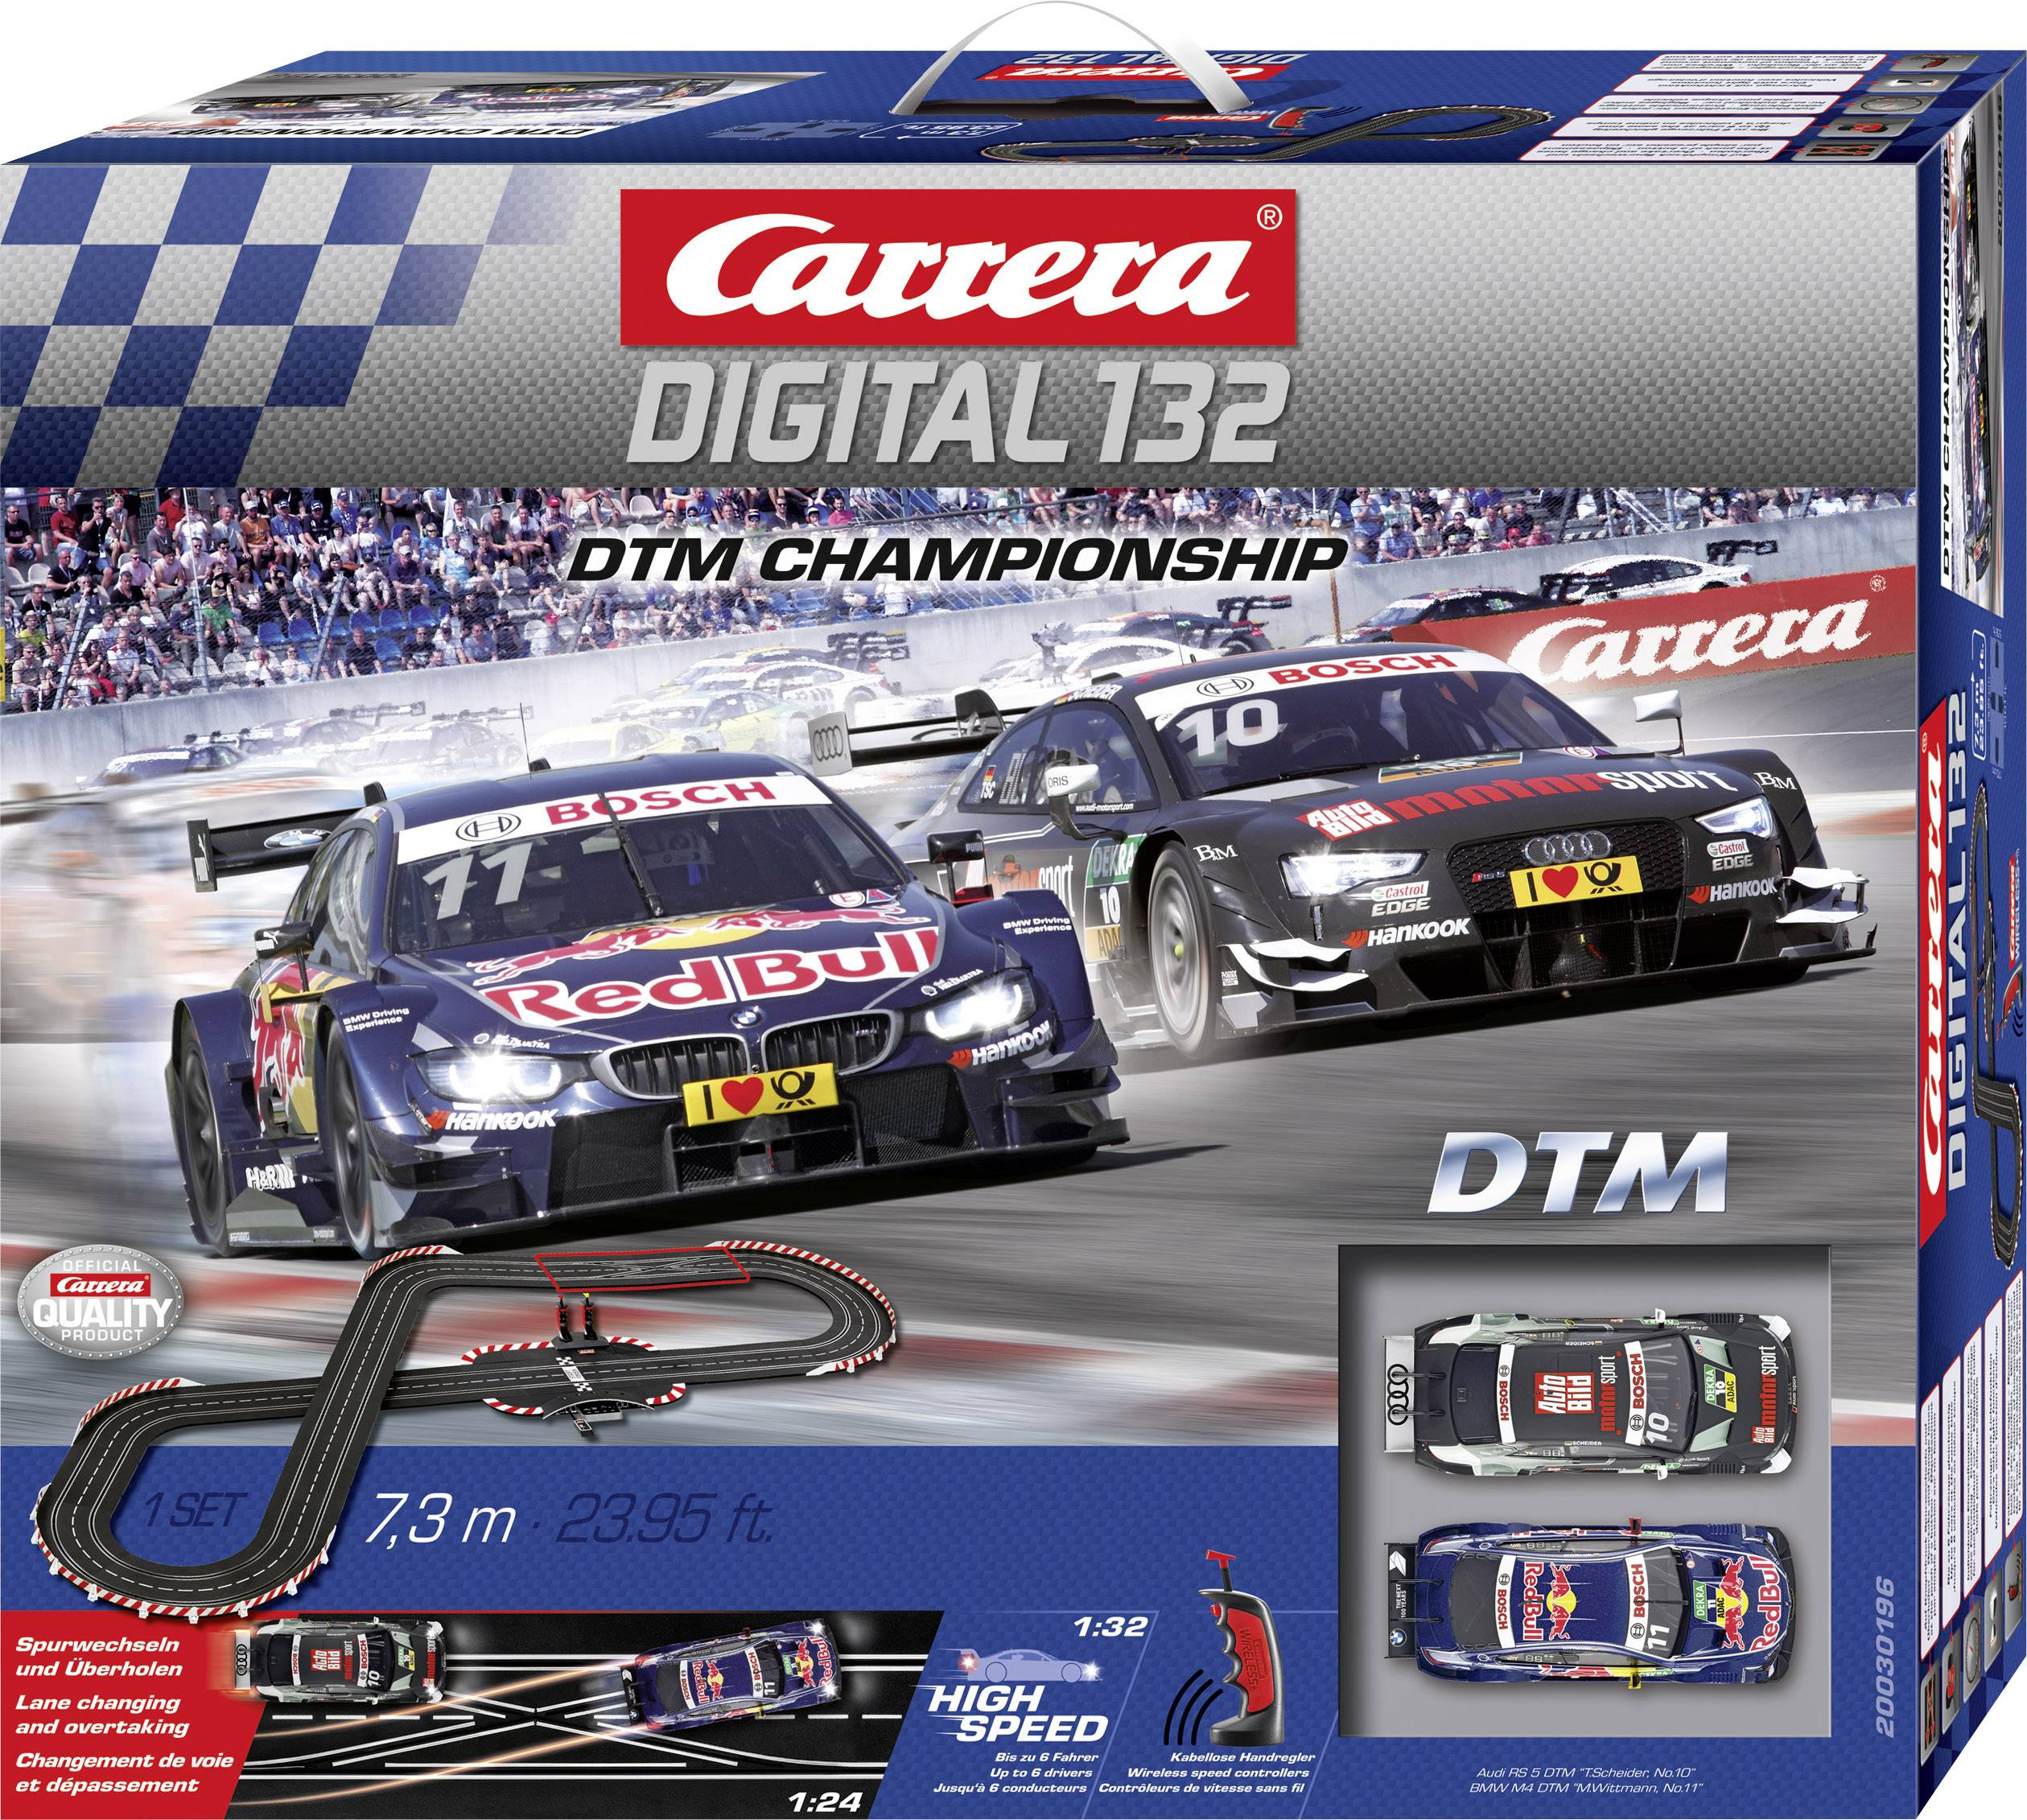 Autodráha, štartovacia sada Carrera DTM Championship 20030196, druh autodráhy DIGITAL 132